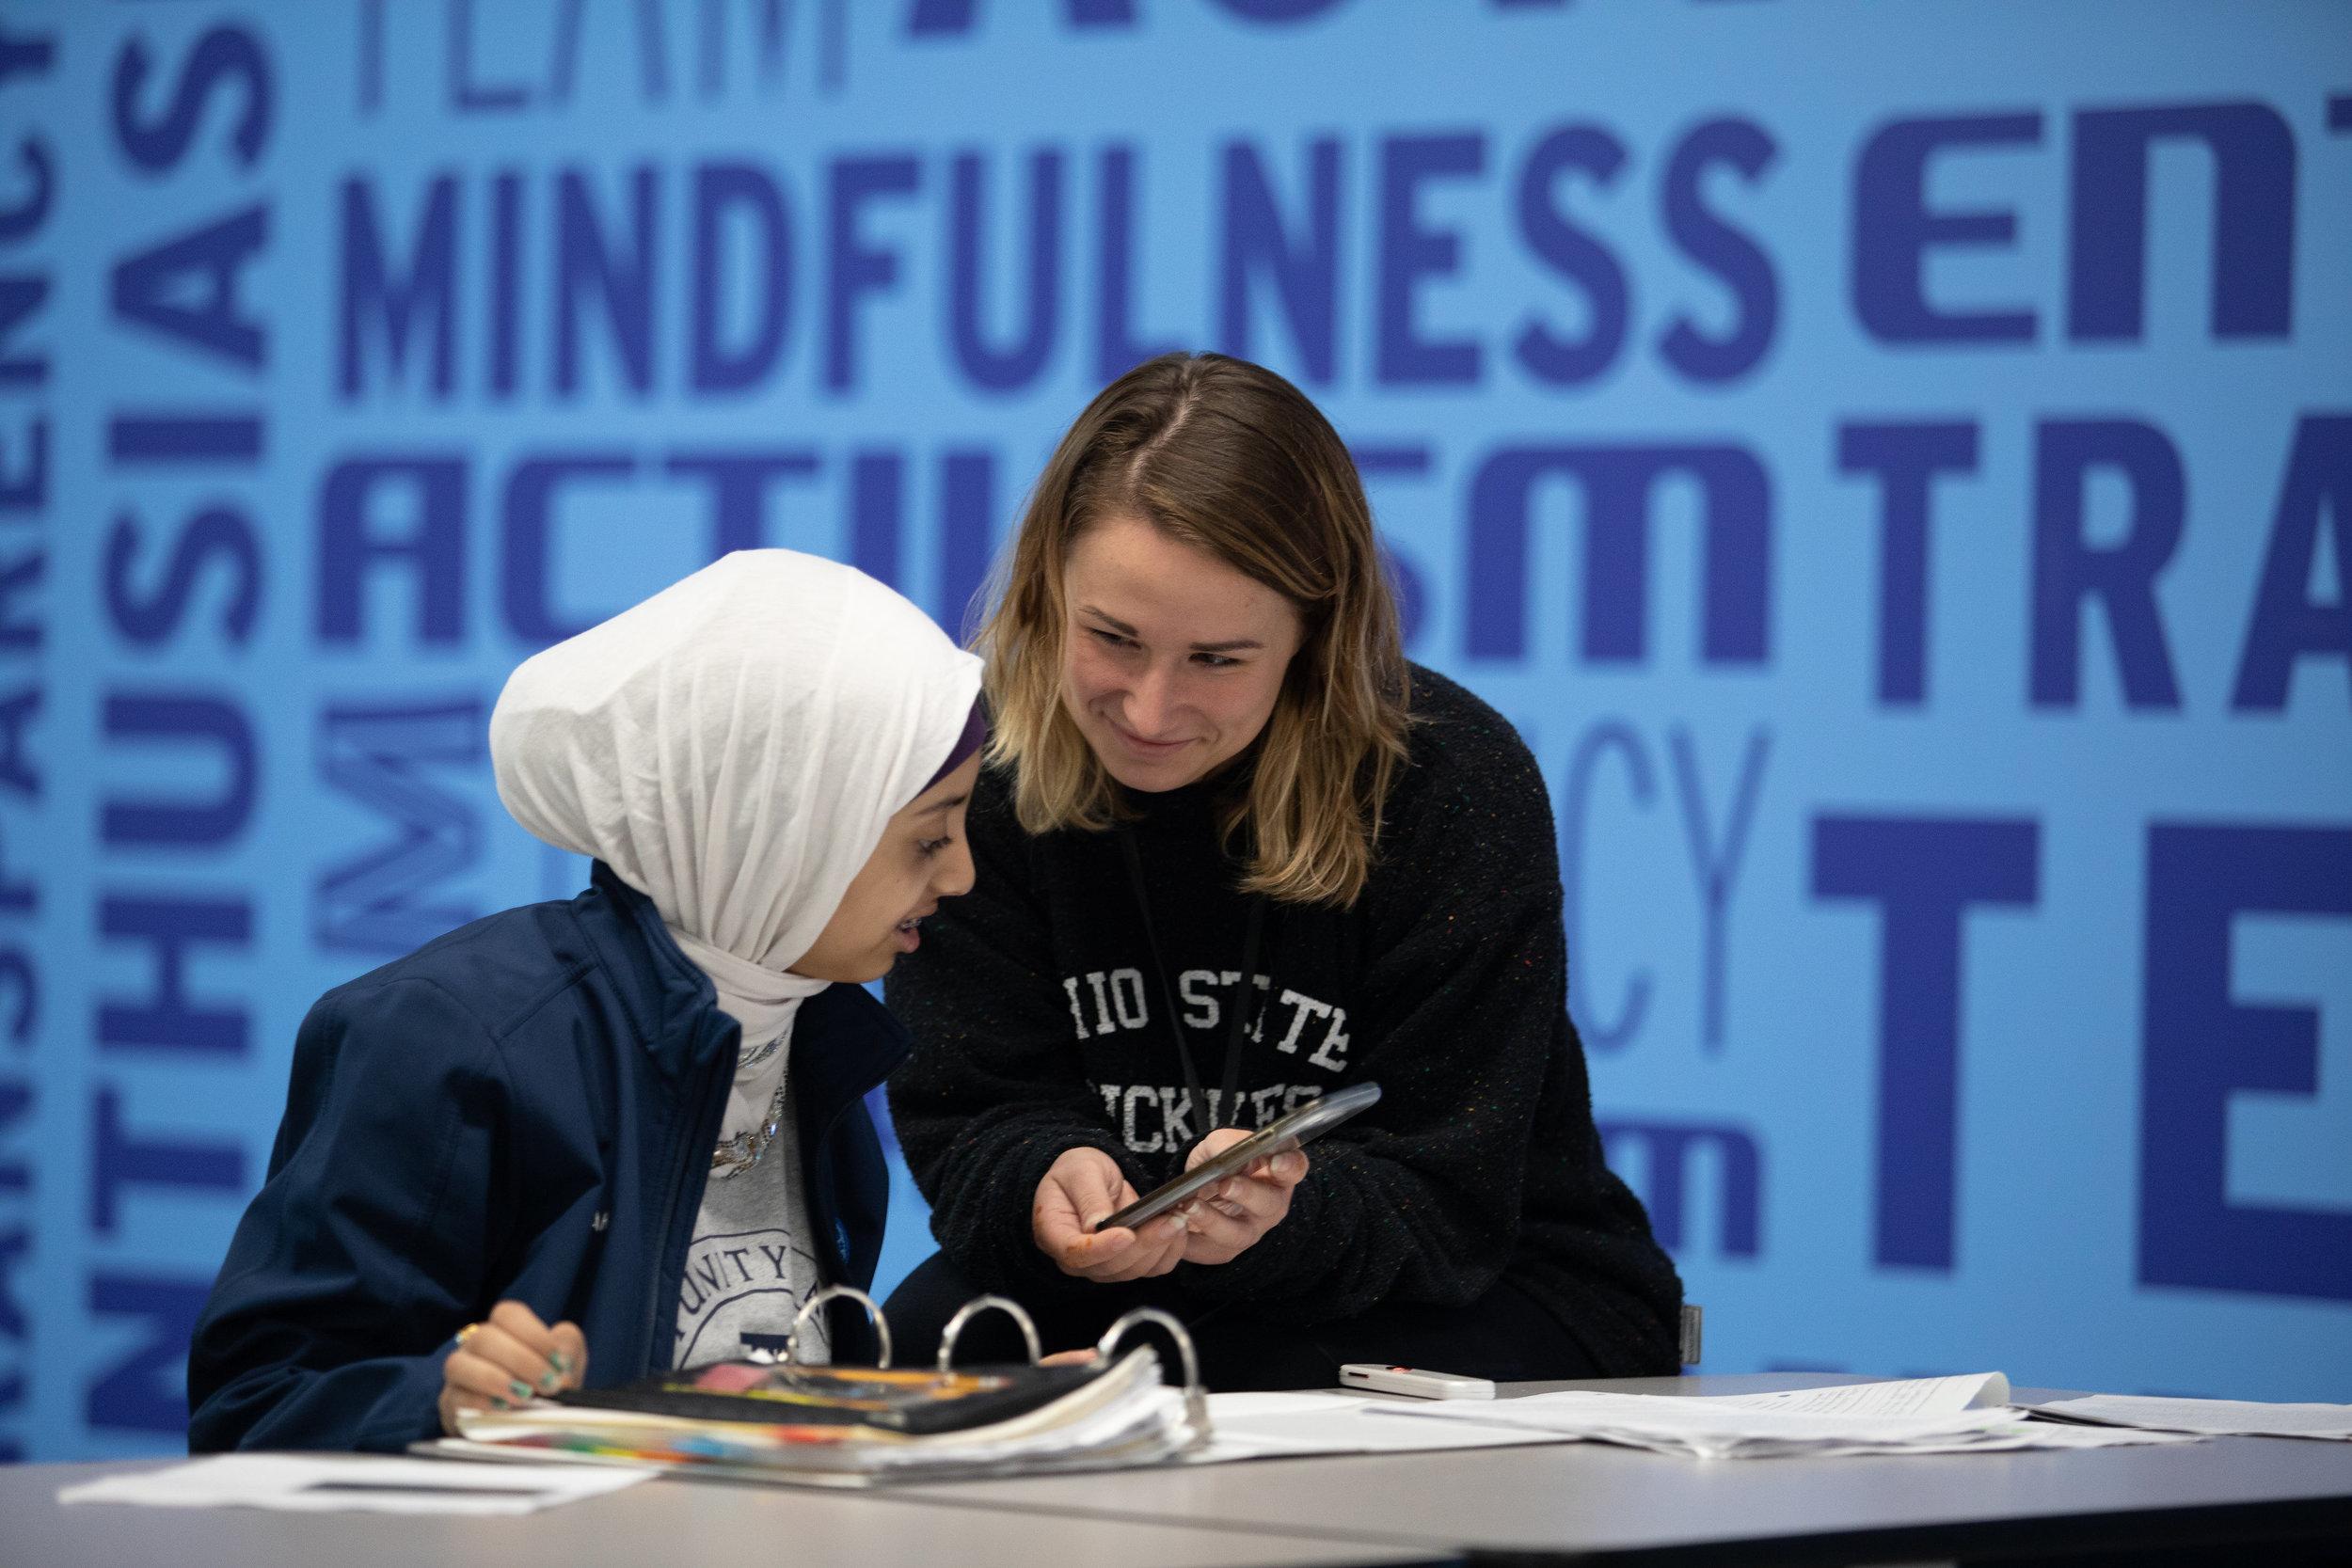 A student at Intrepid College Prep Independence Academy works with Tara Cravens, ESL teacher.